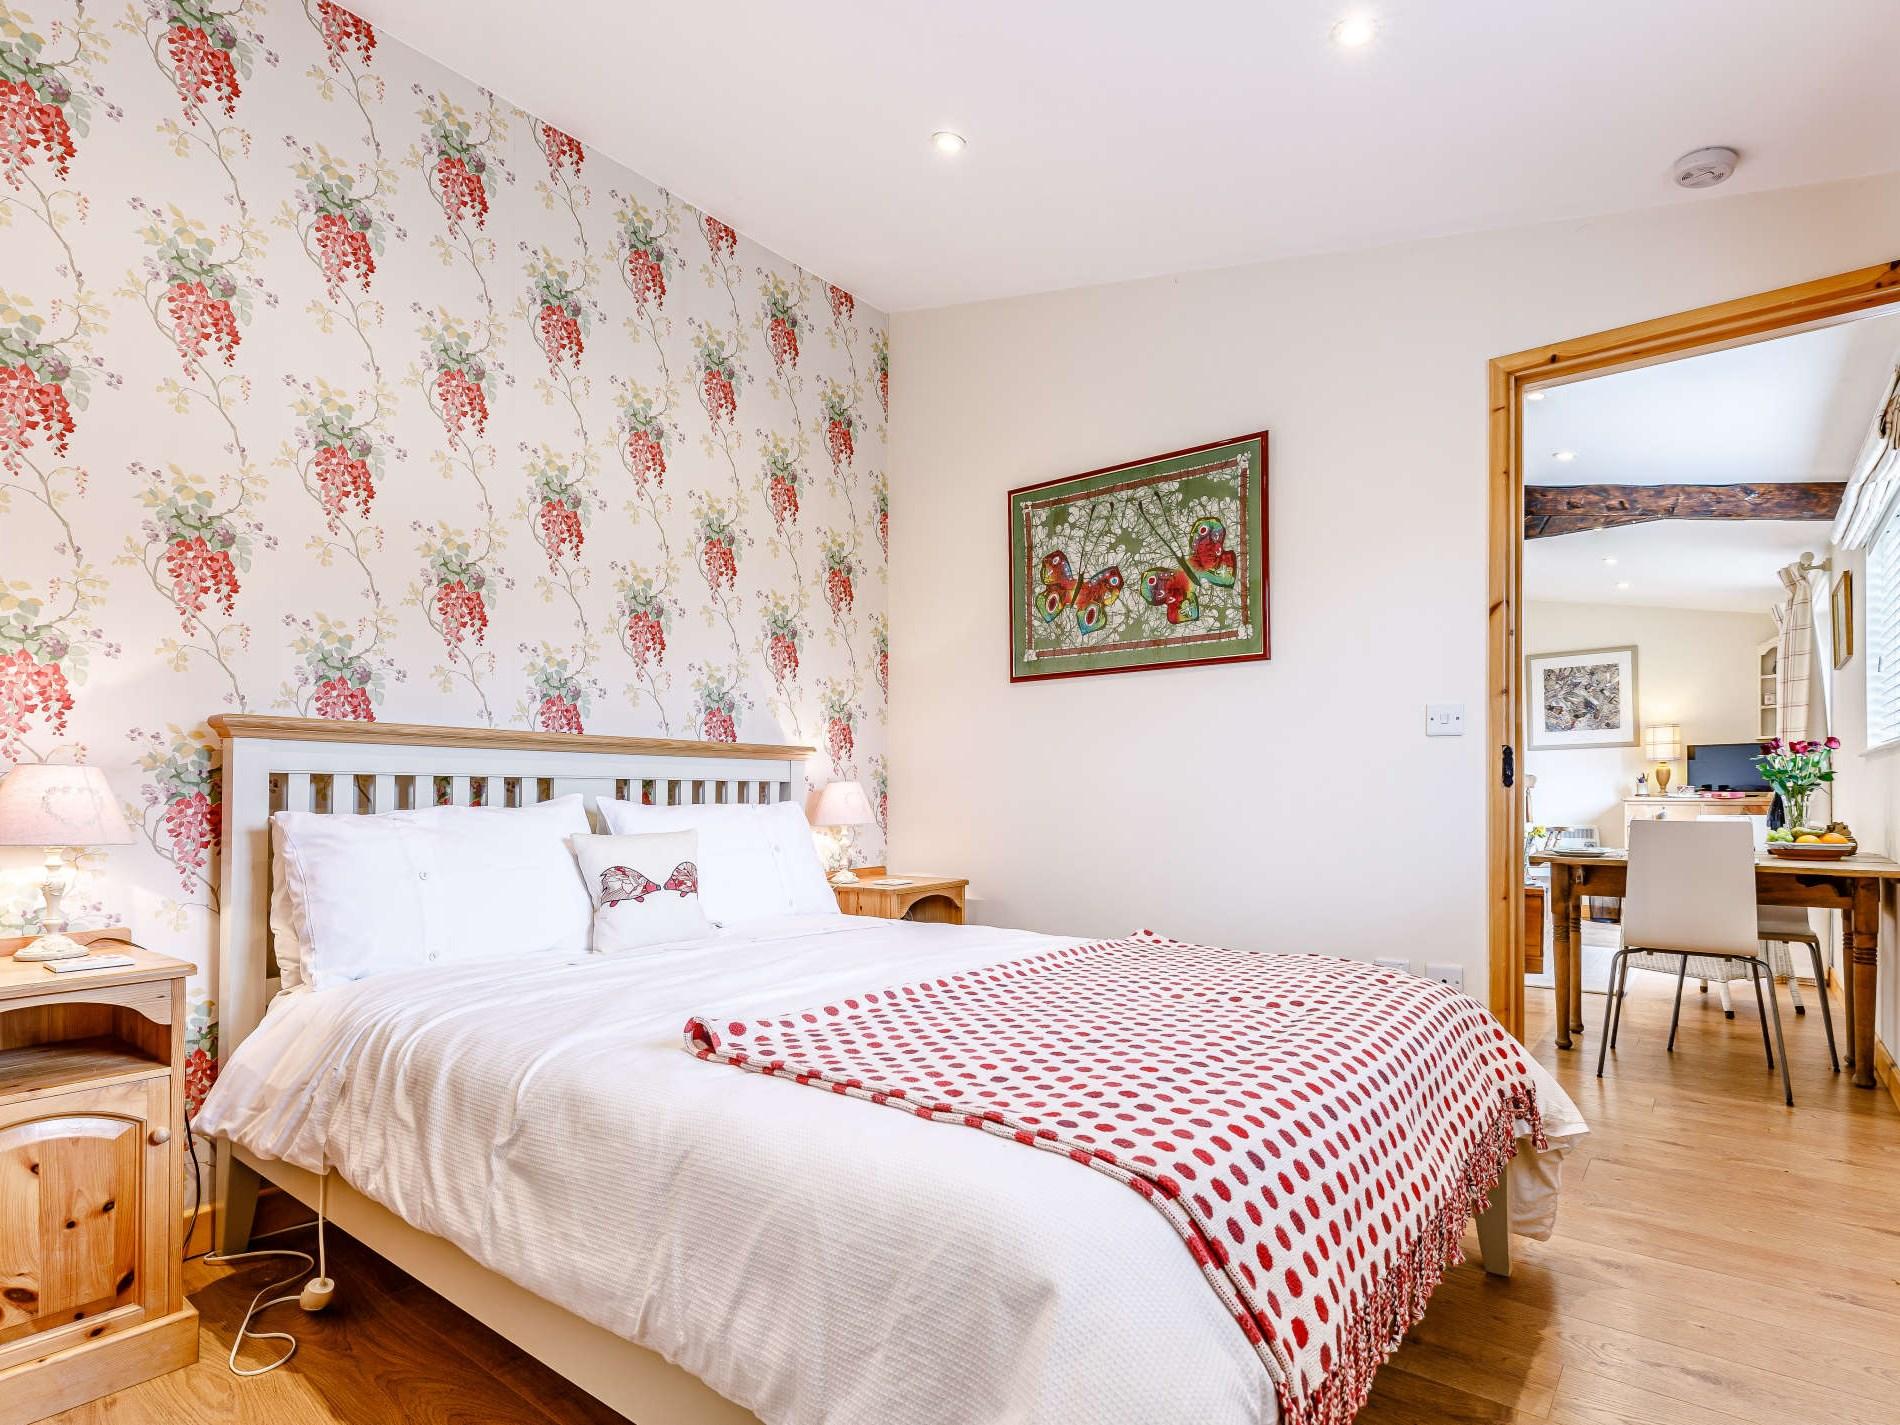 1 Bedroom Cottage in Tewkesbury, Heart of England